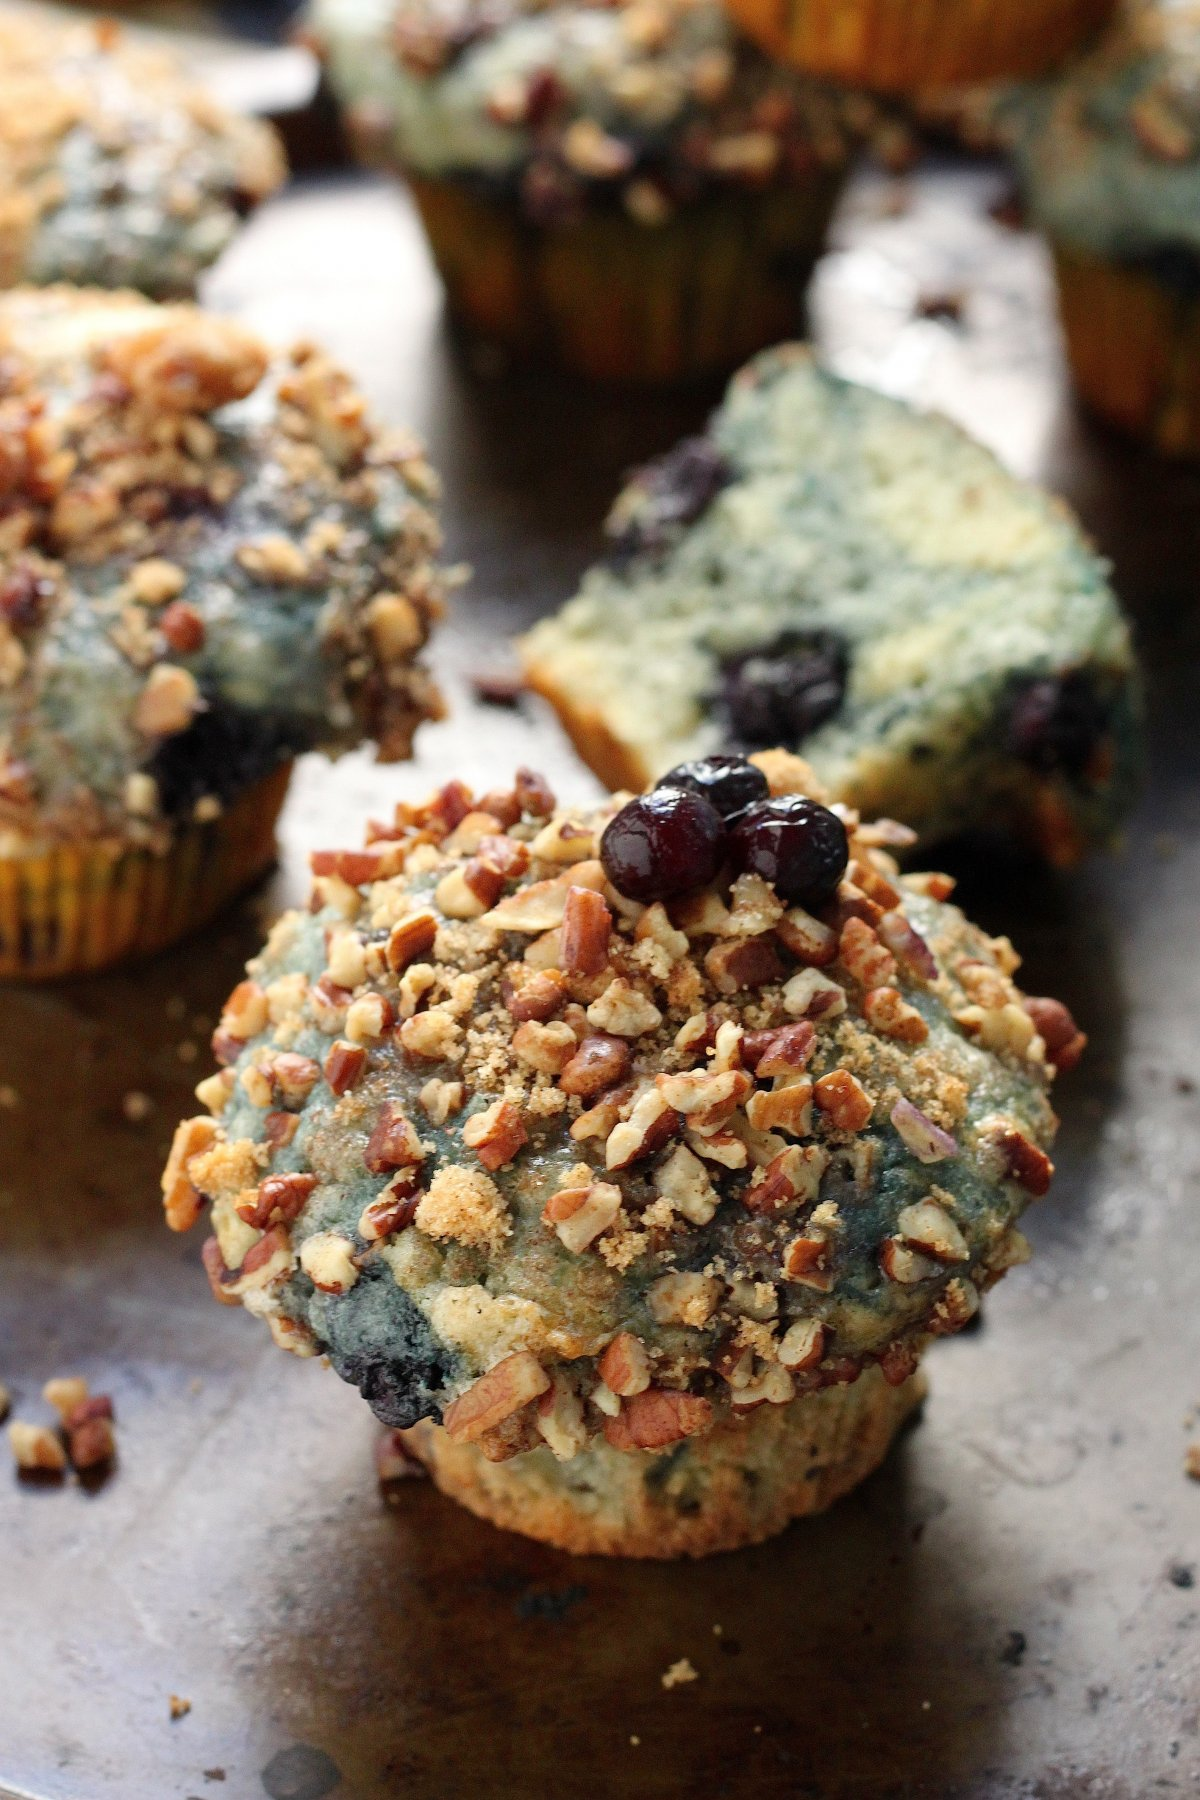 Greek Yogurt Blueberry Crumble Muffins